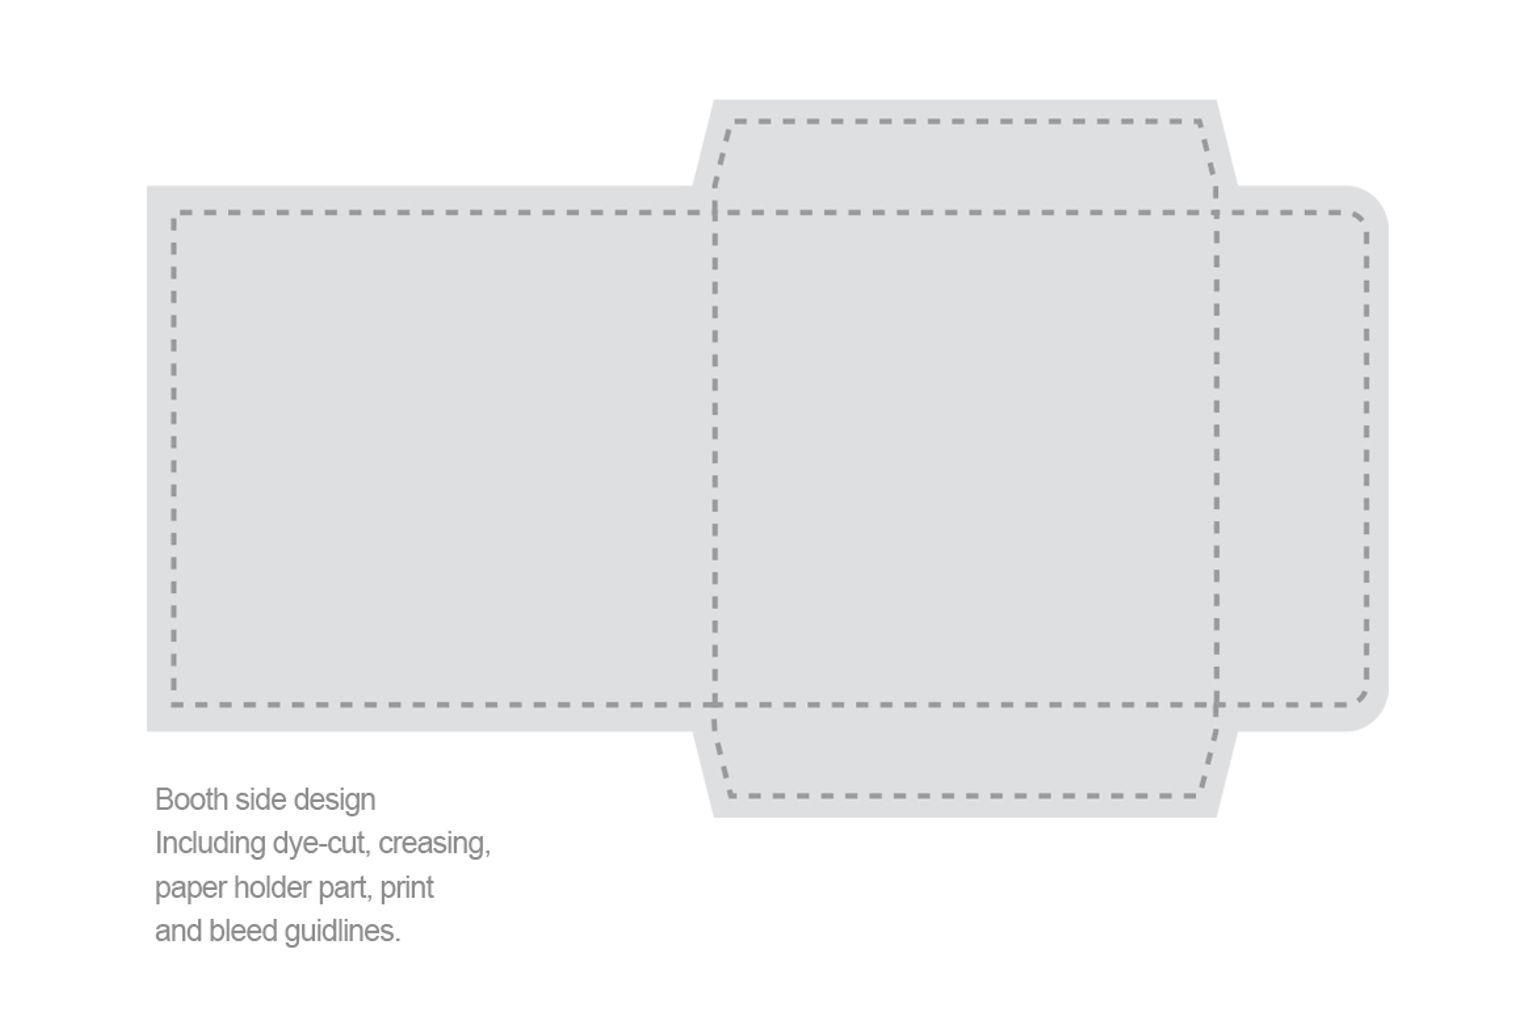 CD / DVD Album Cover Design Corporate Identity Template #67194